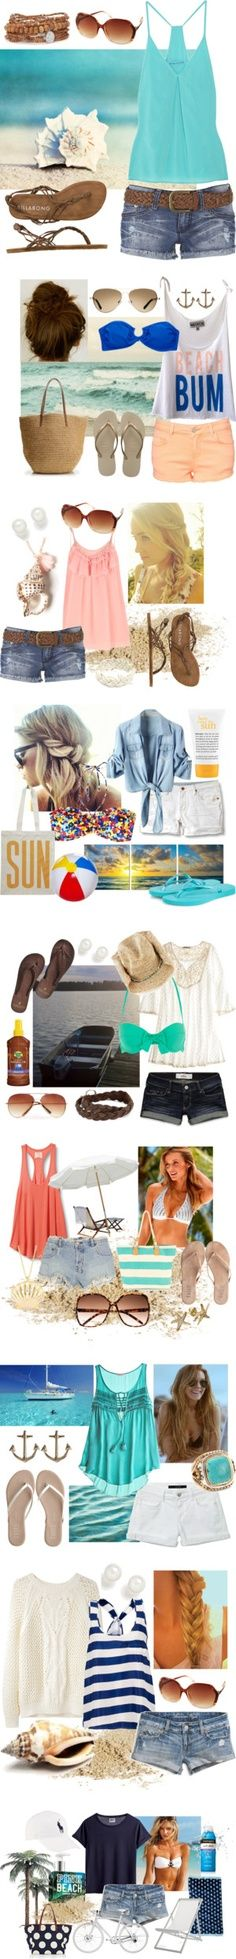 Outfits verano playa chicas